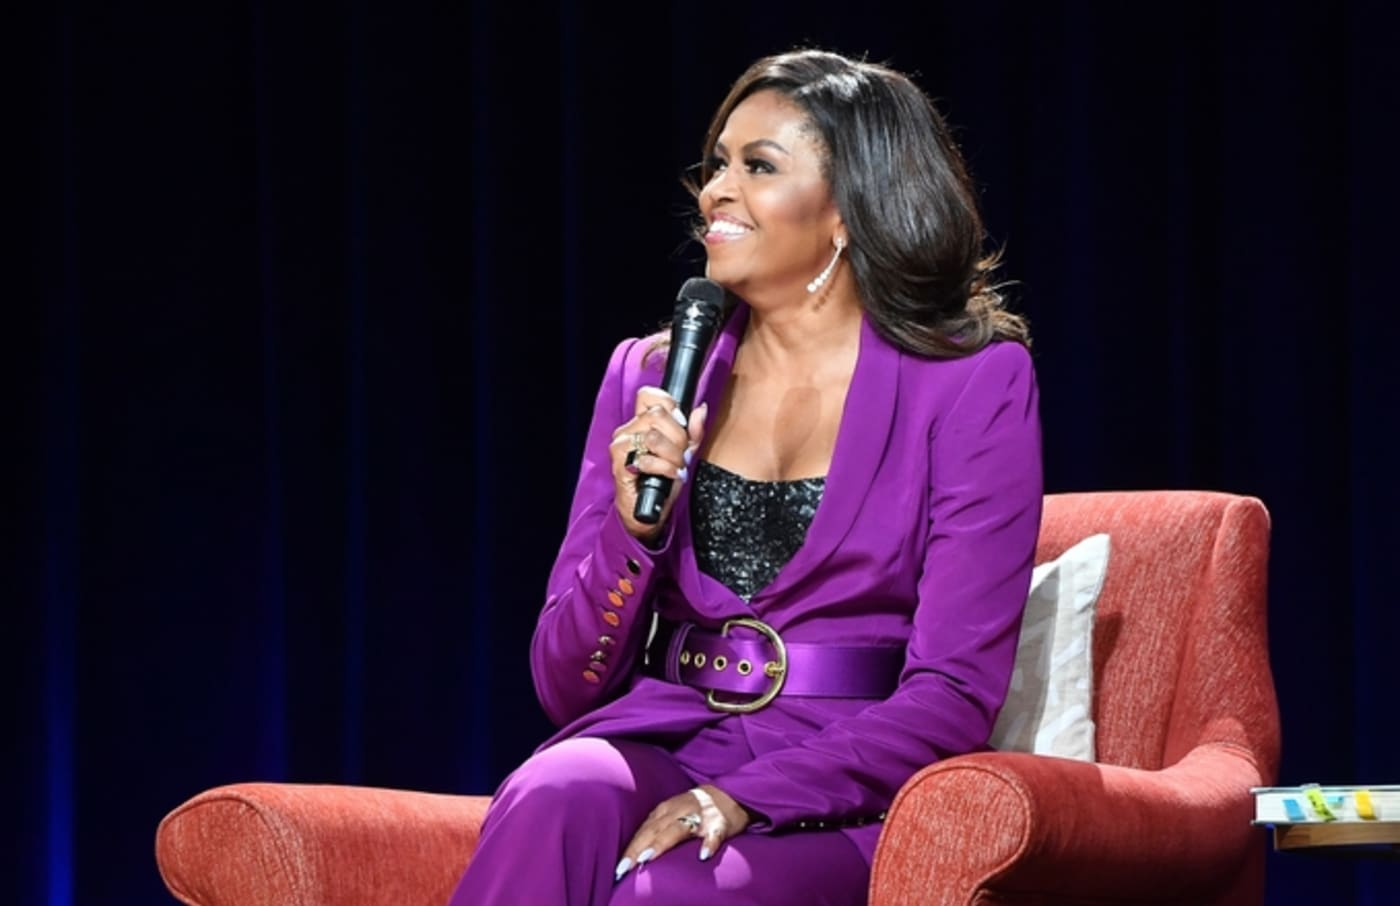 michelle obama stage purple suit